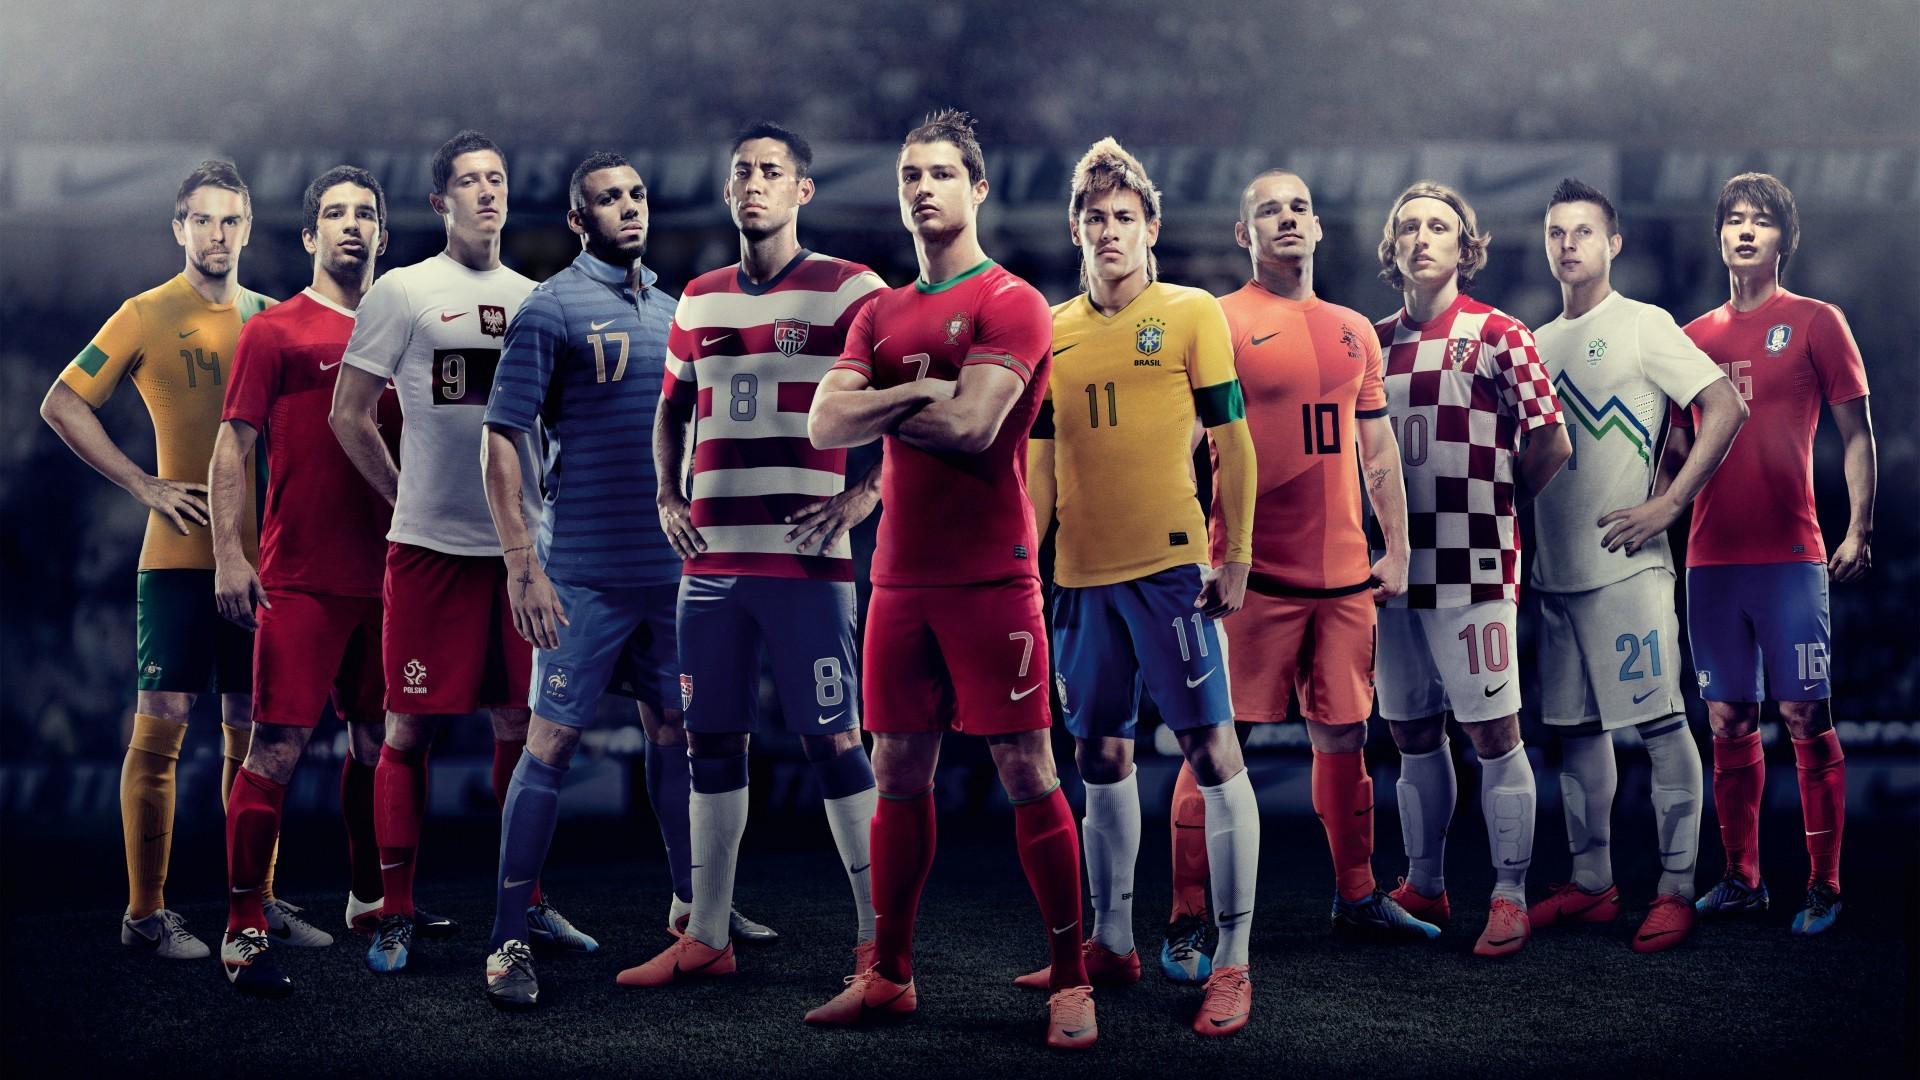 4k Ultra Hd Wallpaper Football: Nike Football Wallpaper HD (68+ Images